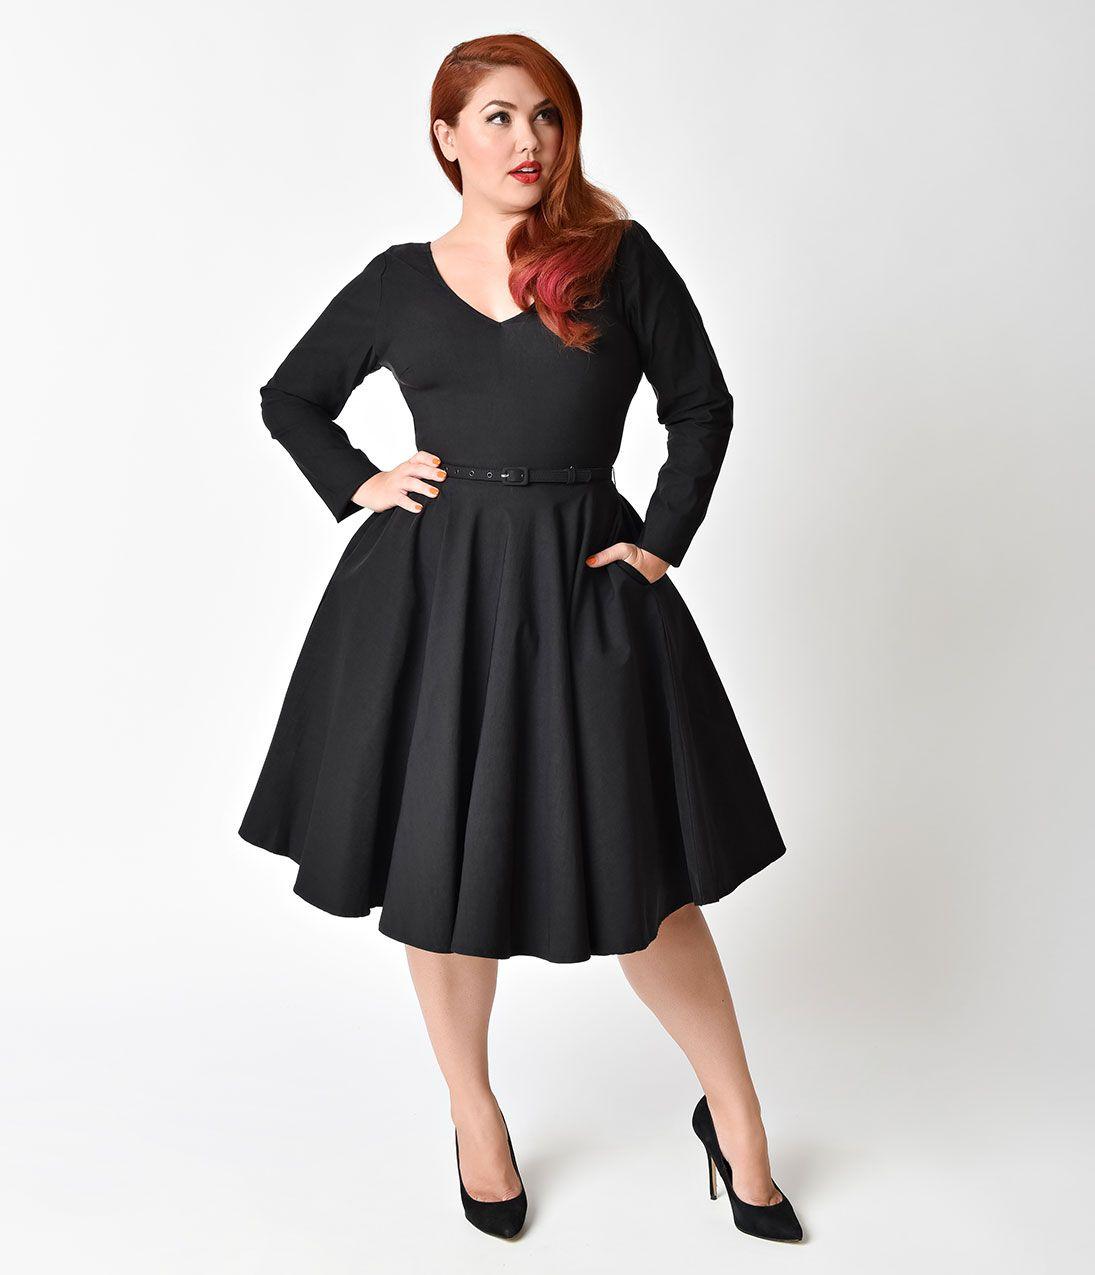 41e5e255434 Plus Size Vintage Dresses